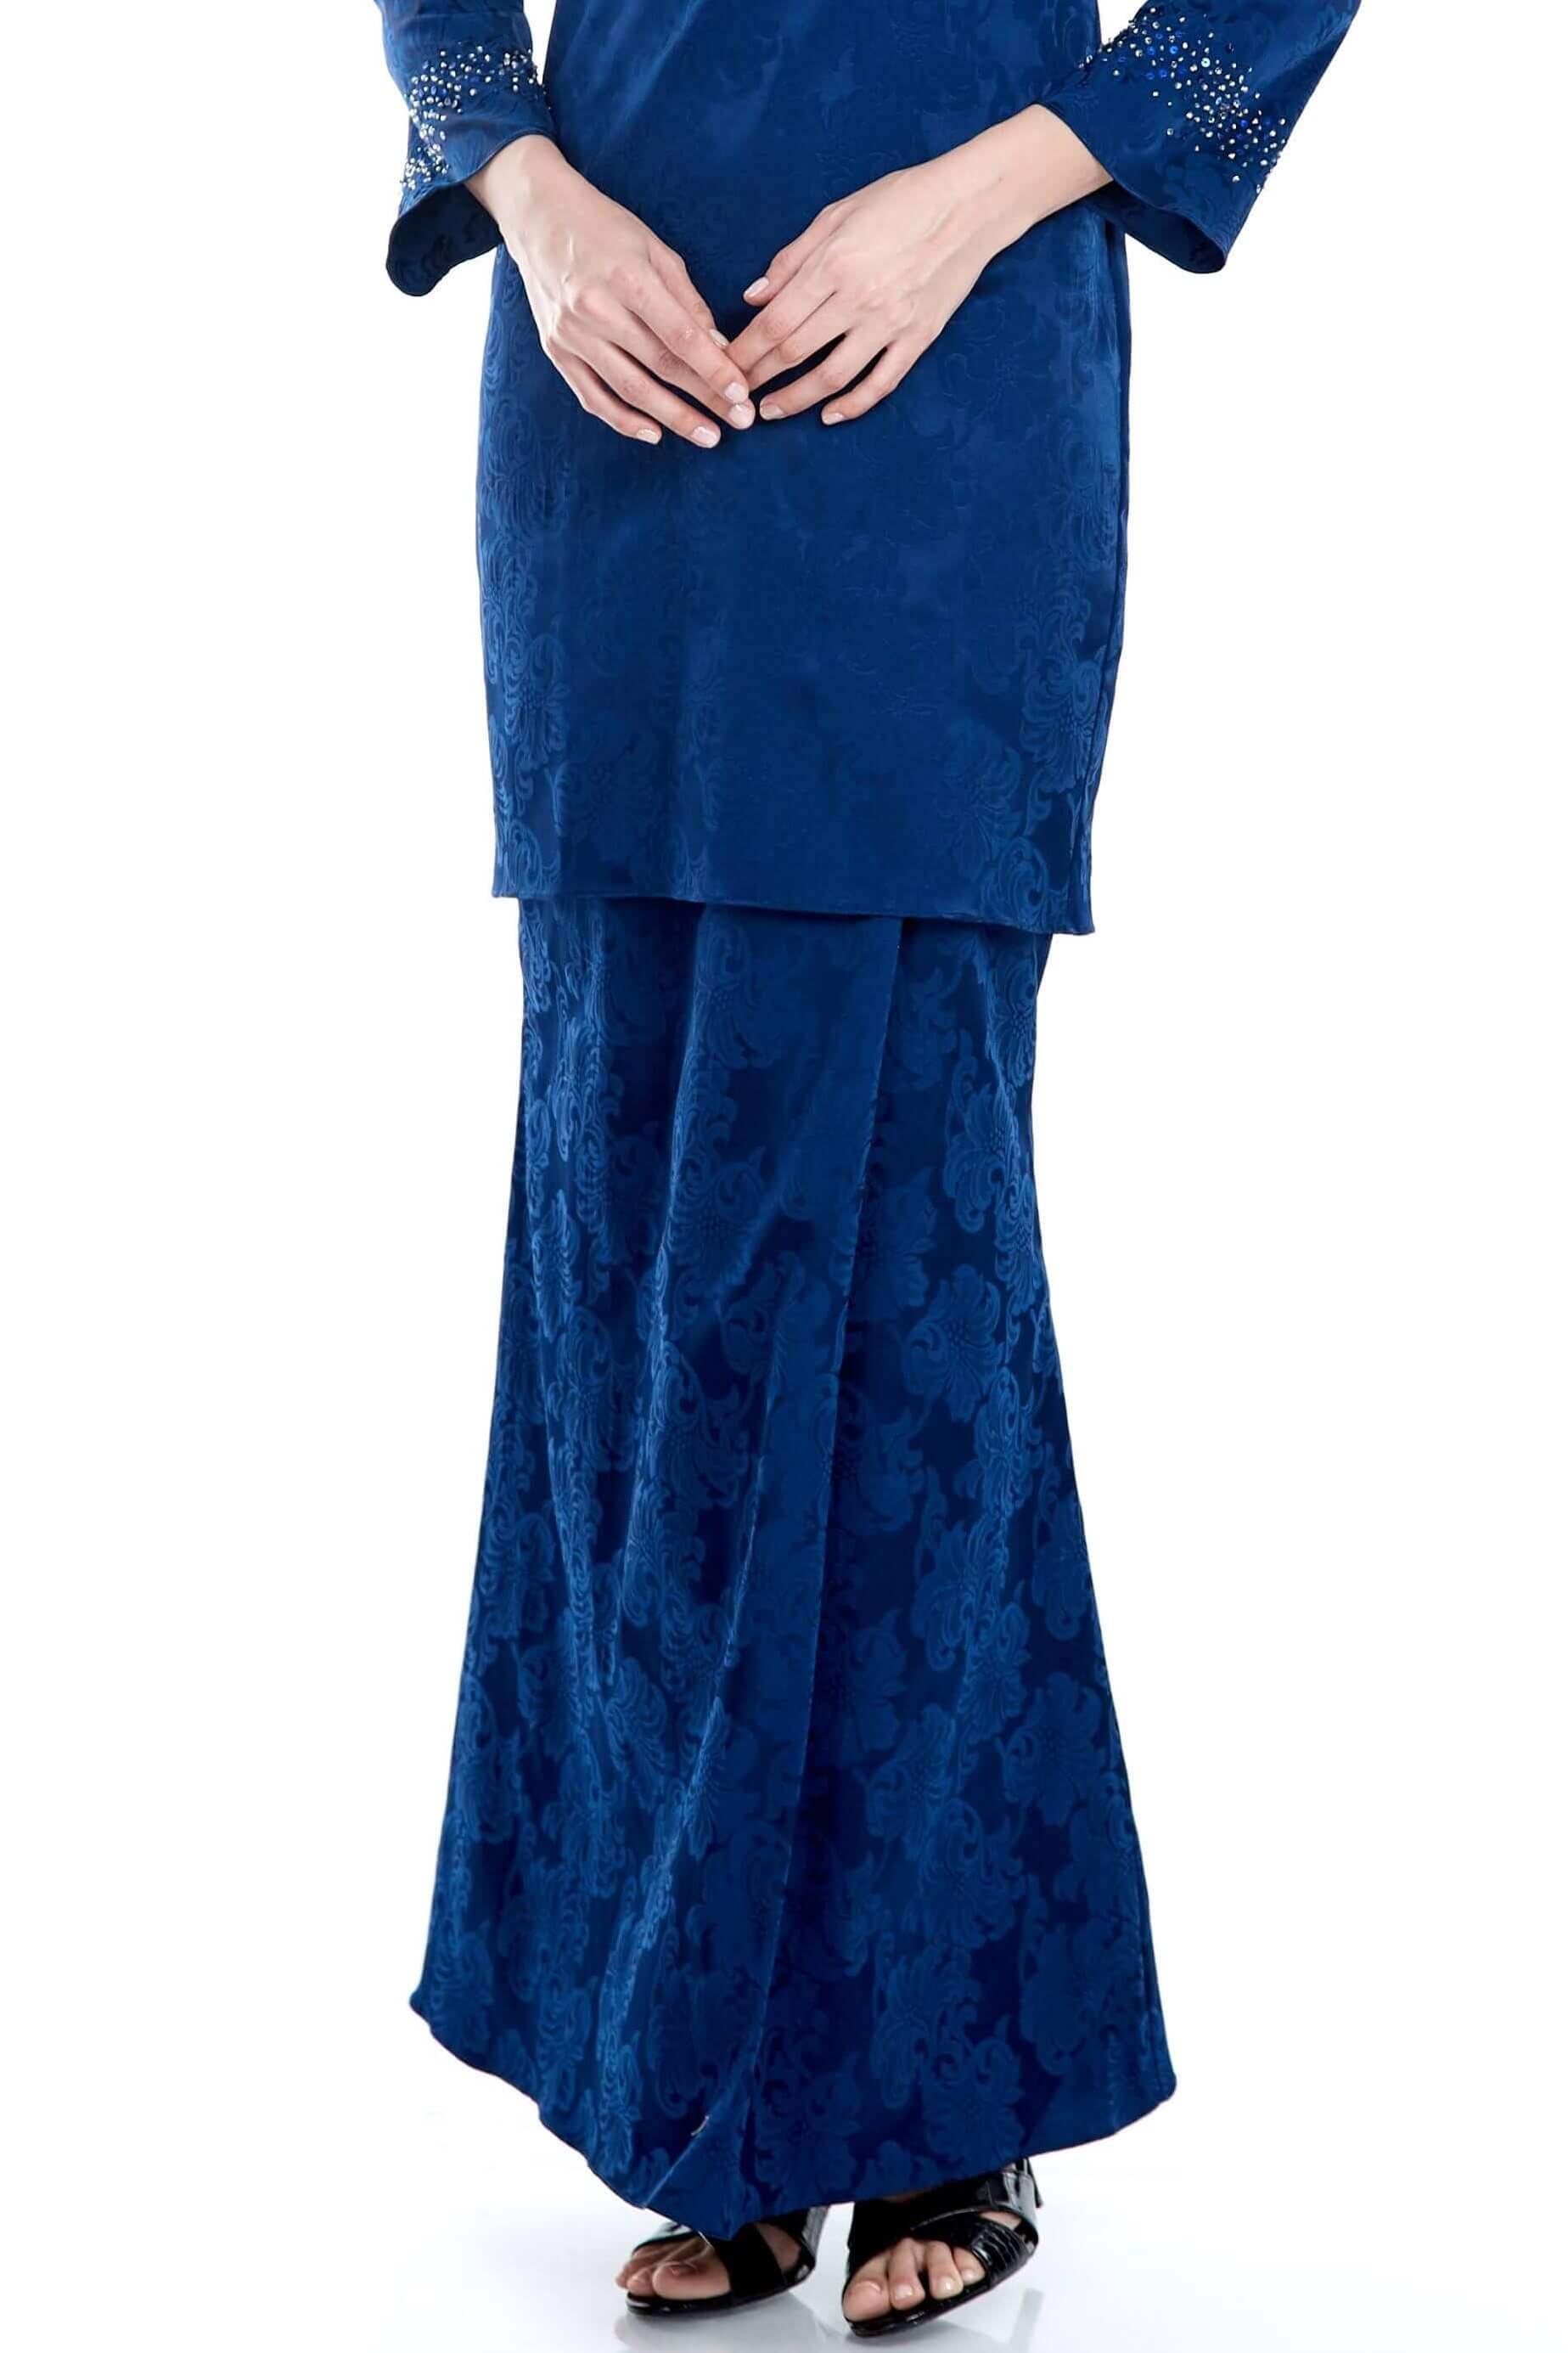 Navy Mermaid Skirt (6)